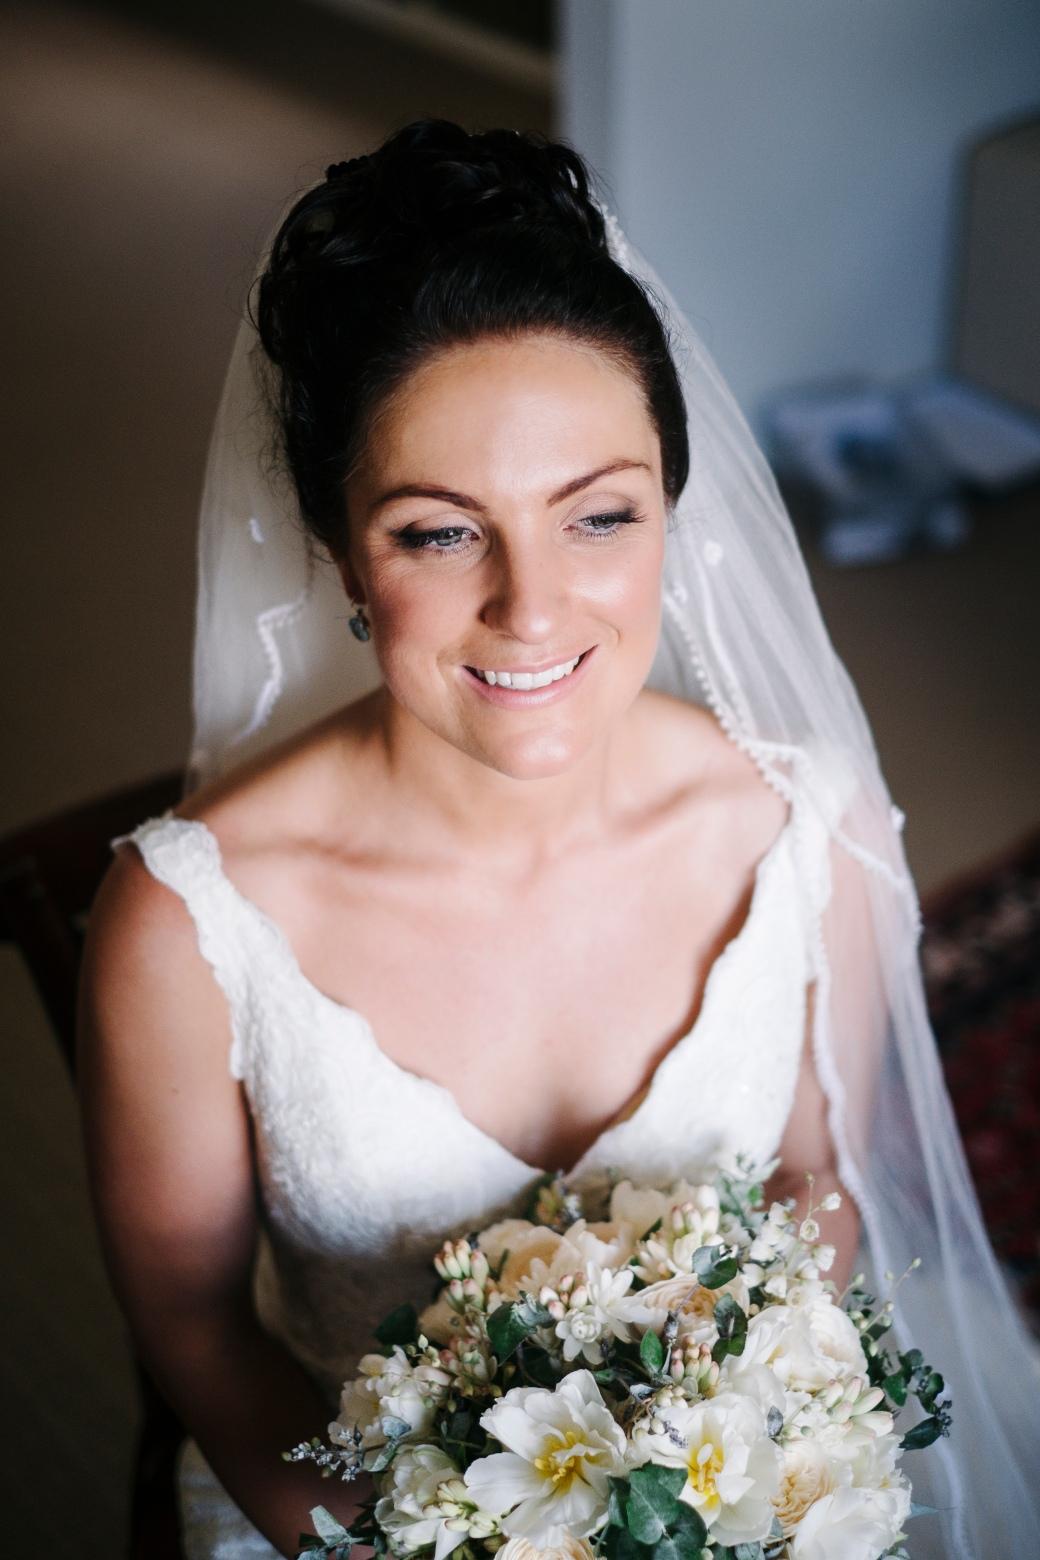 Jilske_Photography_Wedding_Natalie_Alex-0193